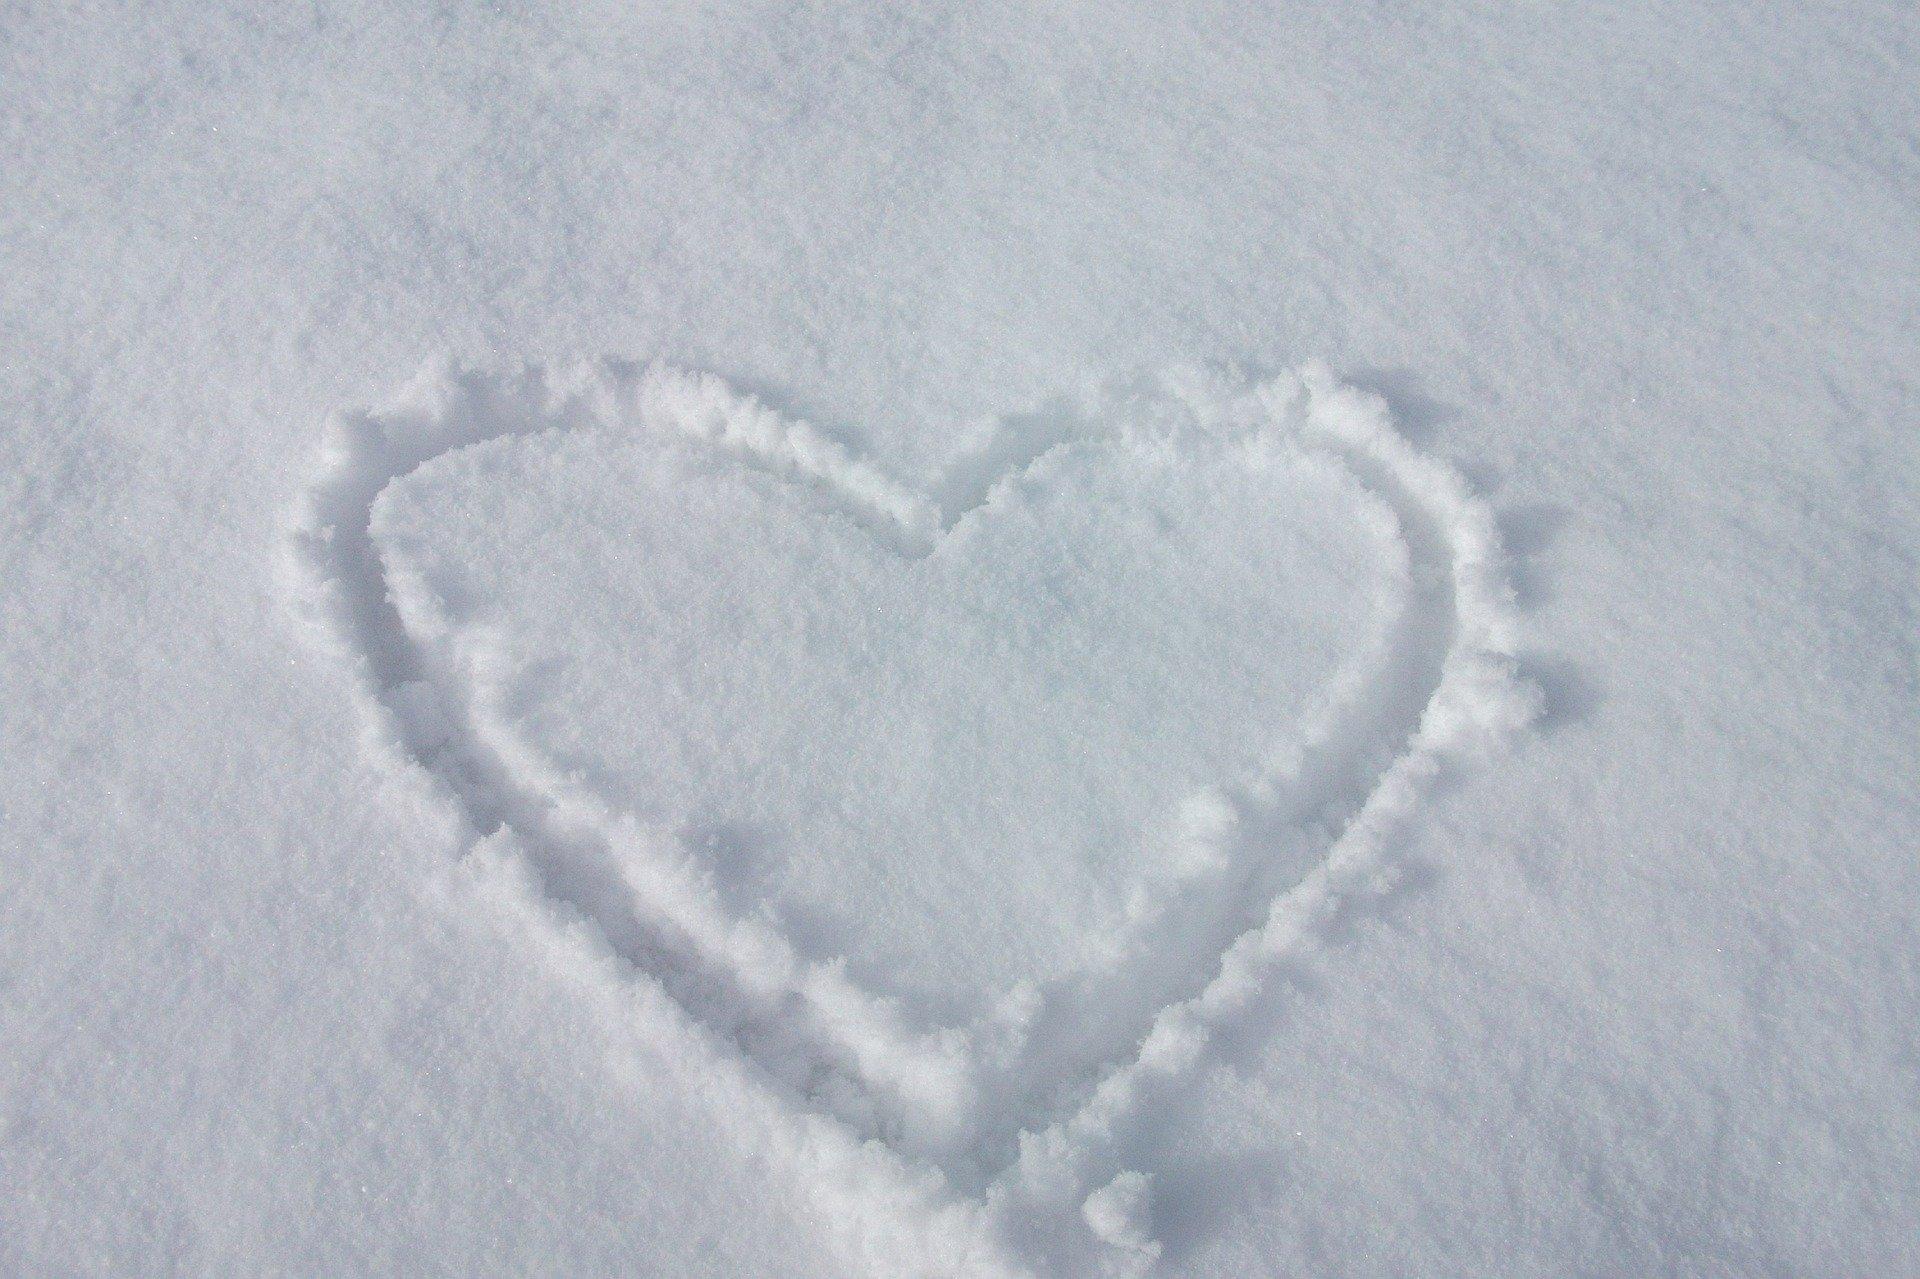 heart-in-snow